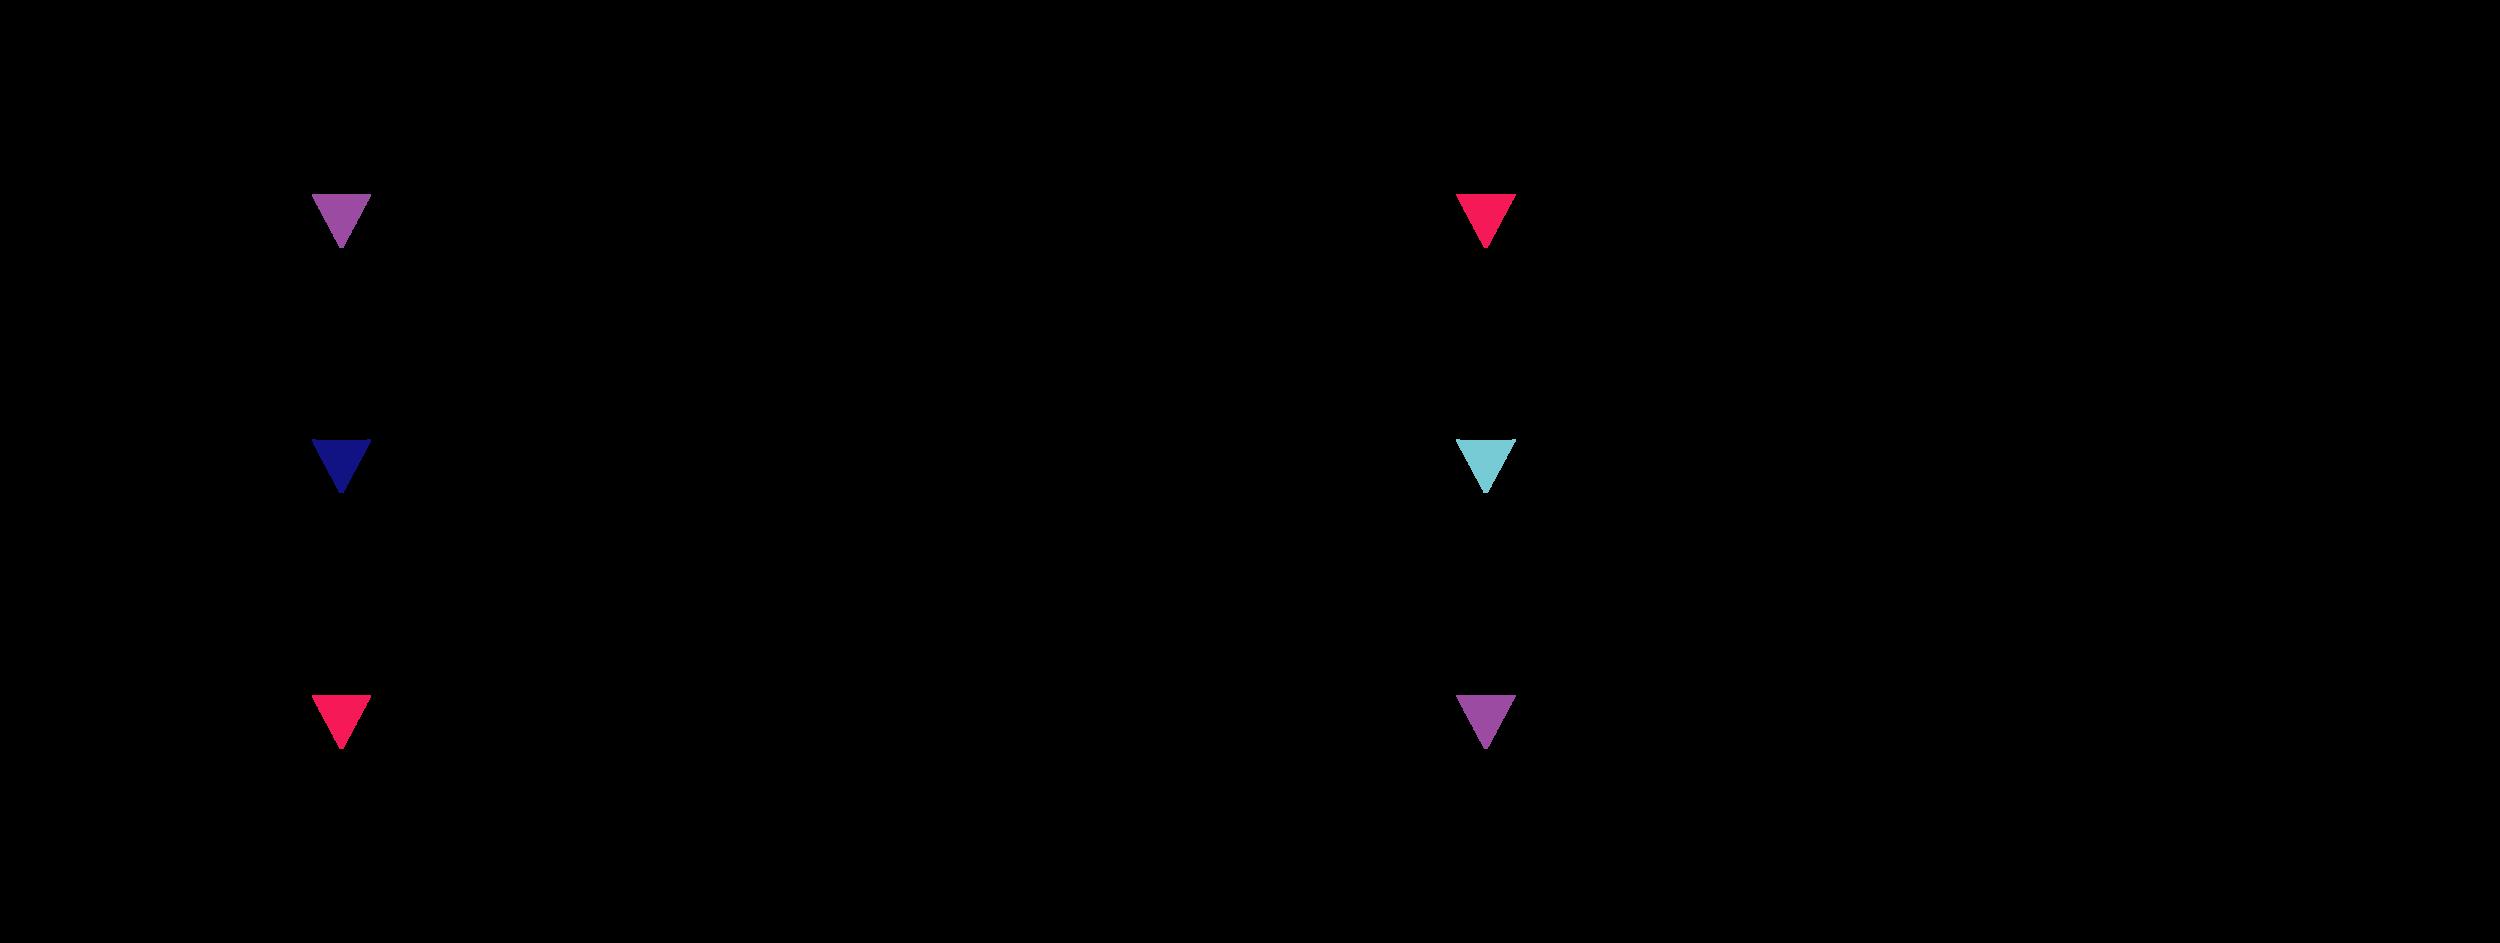 VClip Features-01.png